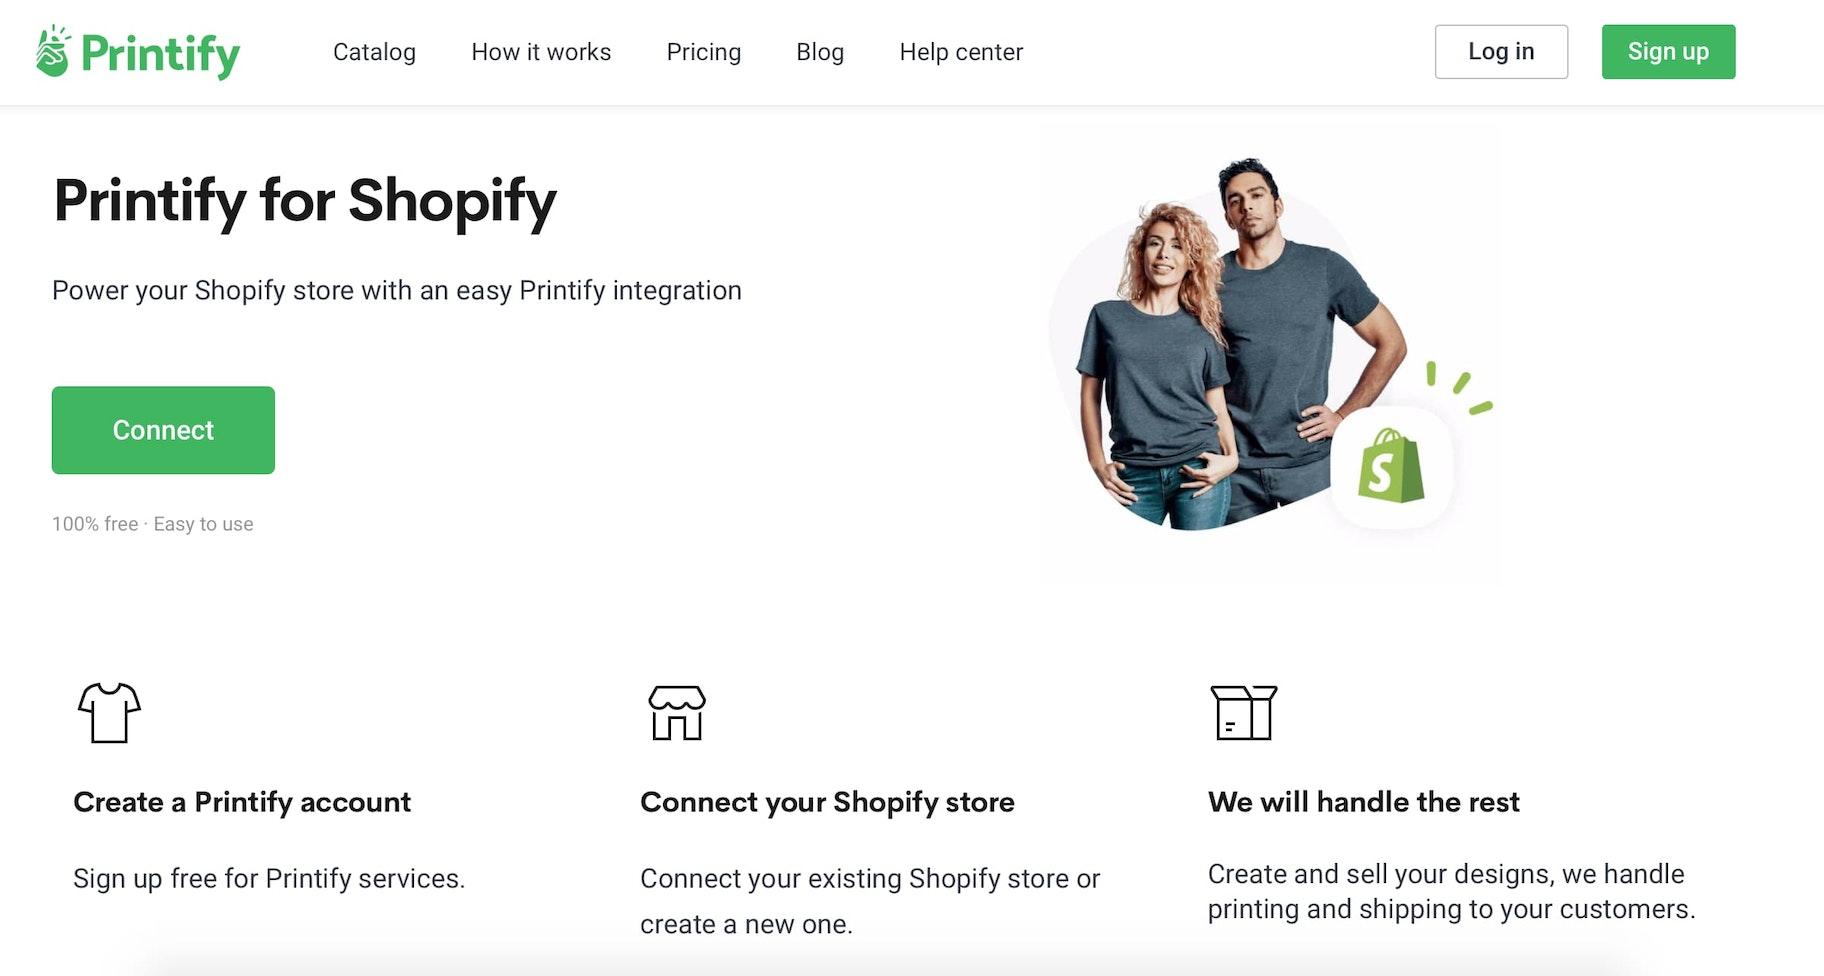 Mockup-camiseta-Printify-para-Shopify